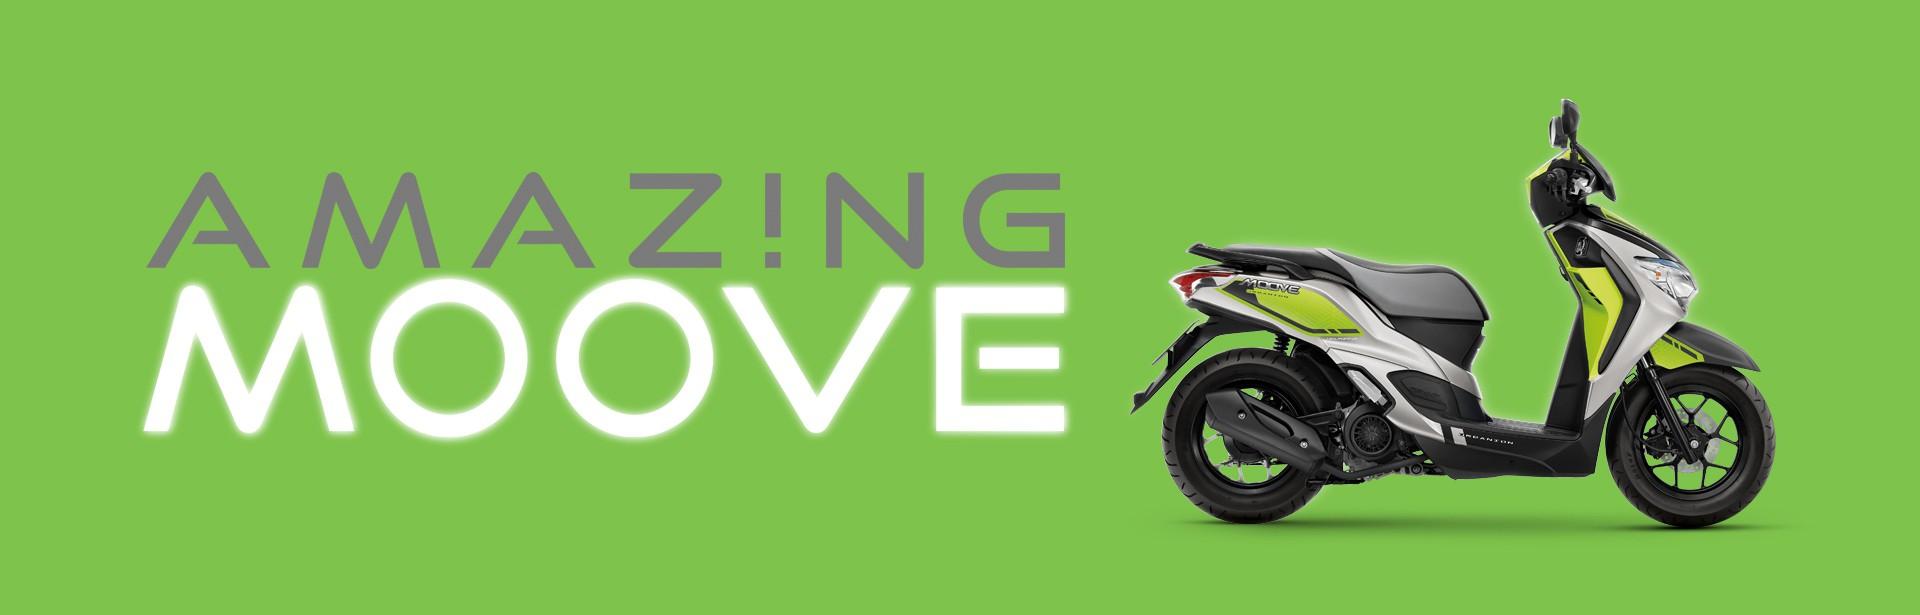 Honda-Motorcycle-มอเตอร์ไซค์-ฮอนด้า-Moove-2017